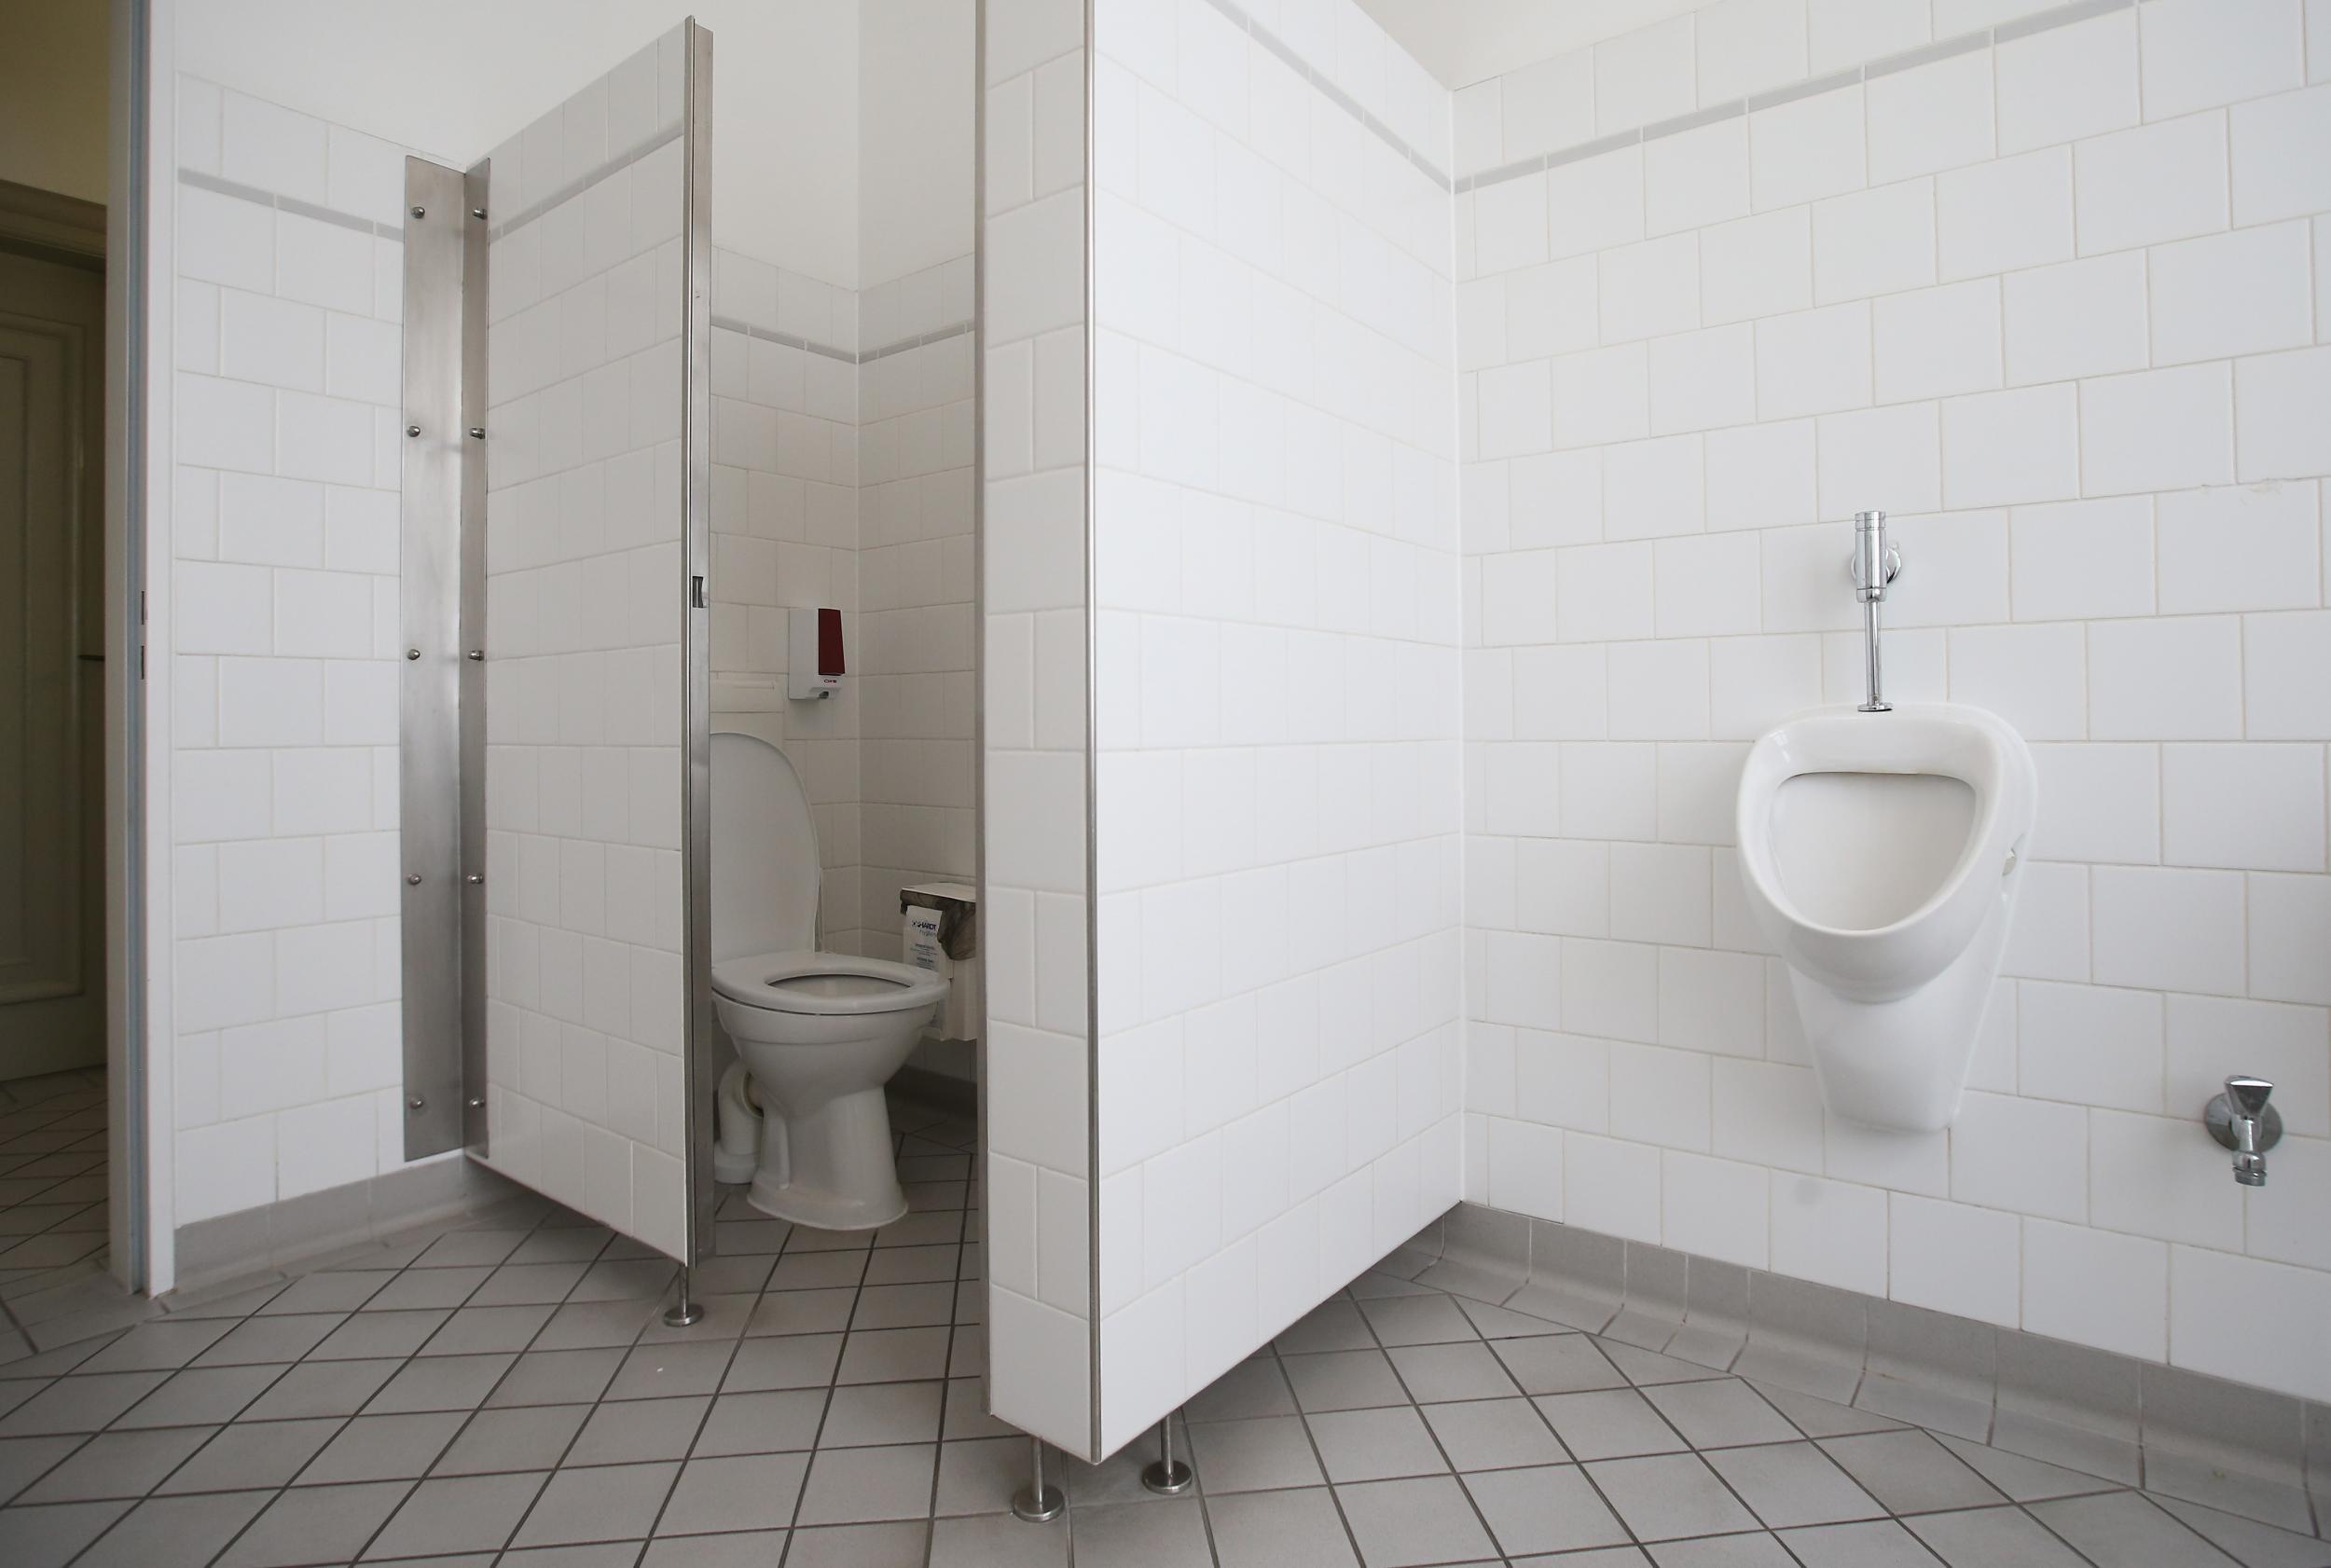 North Carolinas anti-trans bathroom law is ridiculous